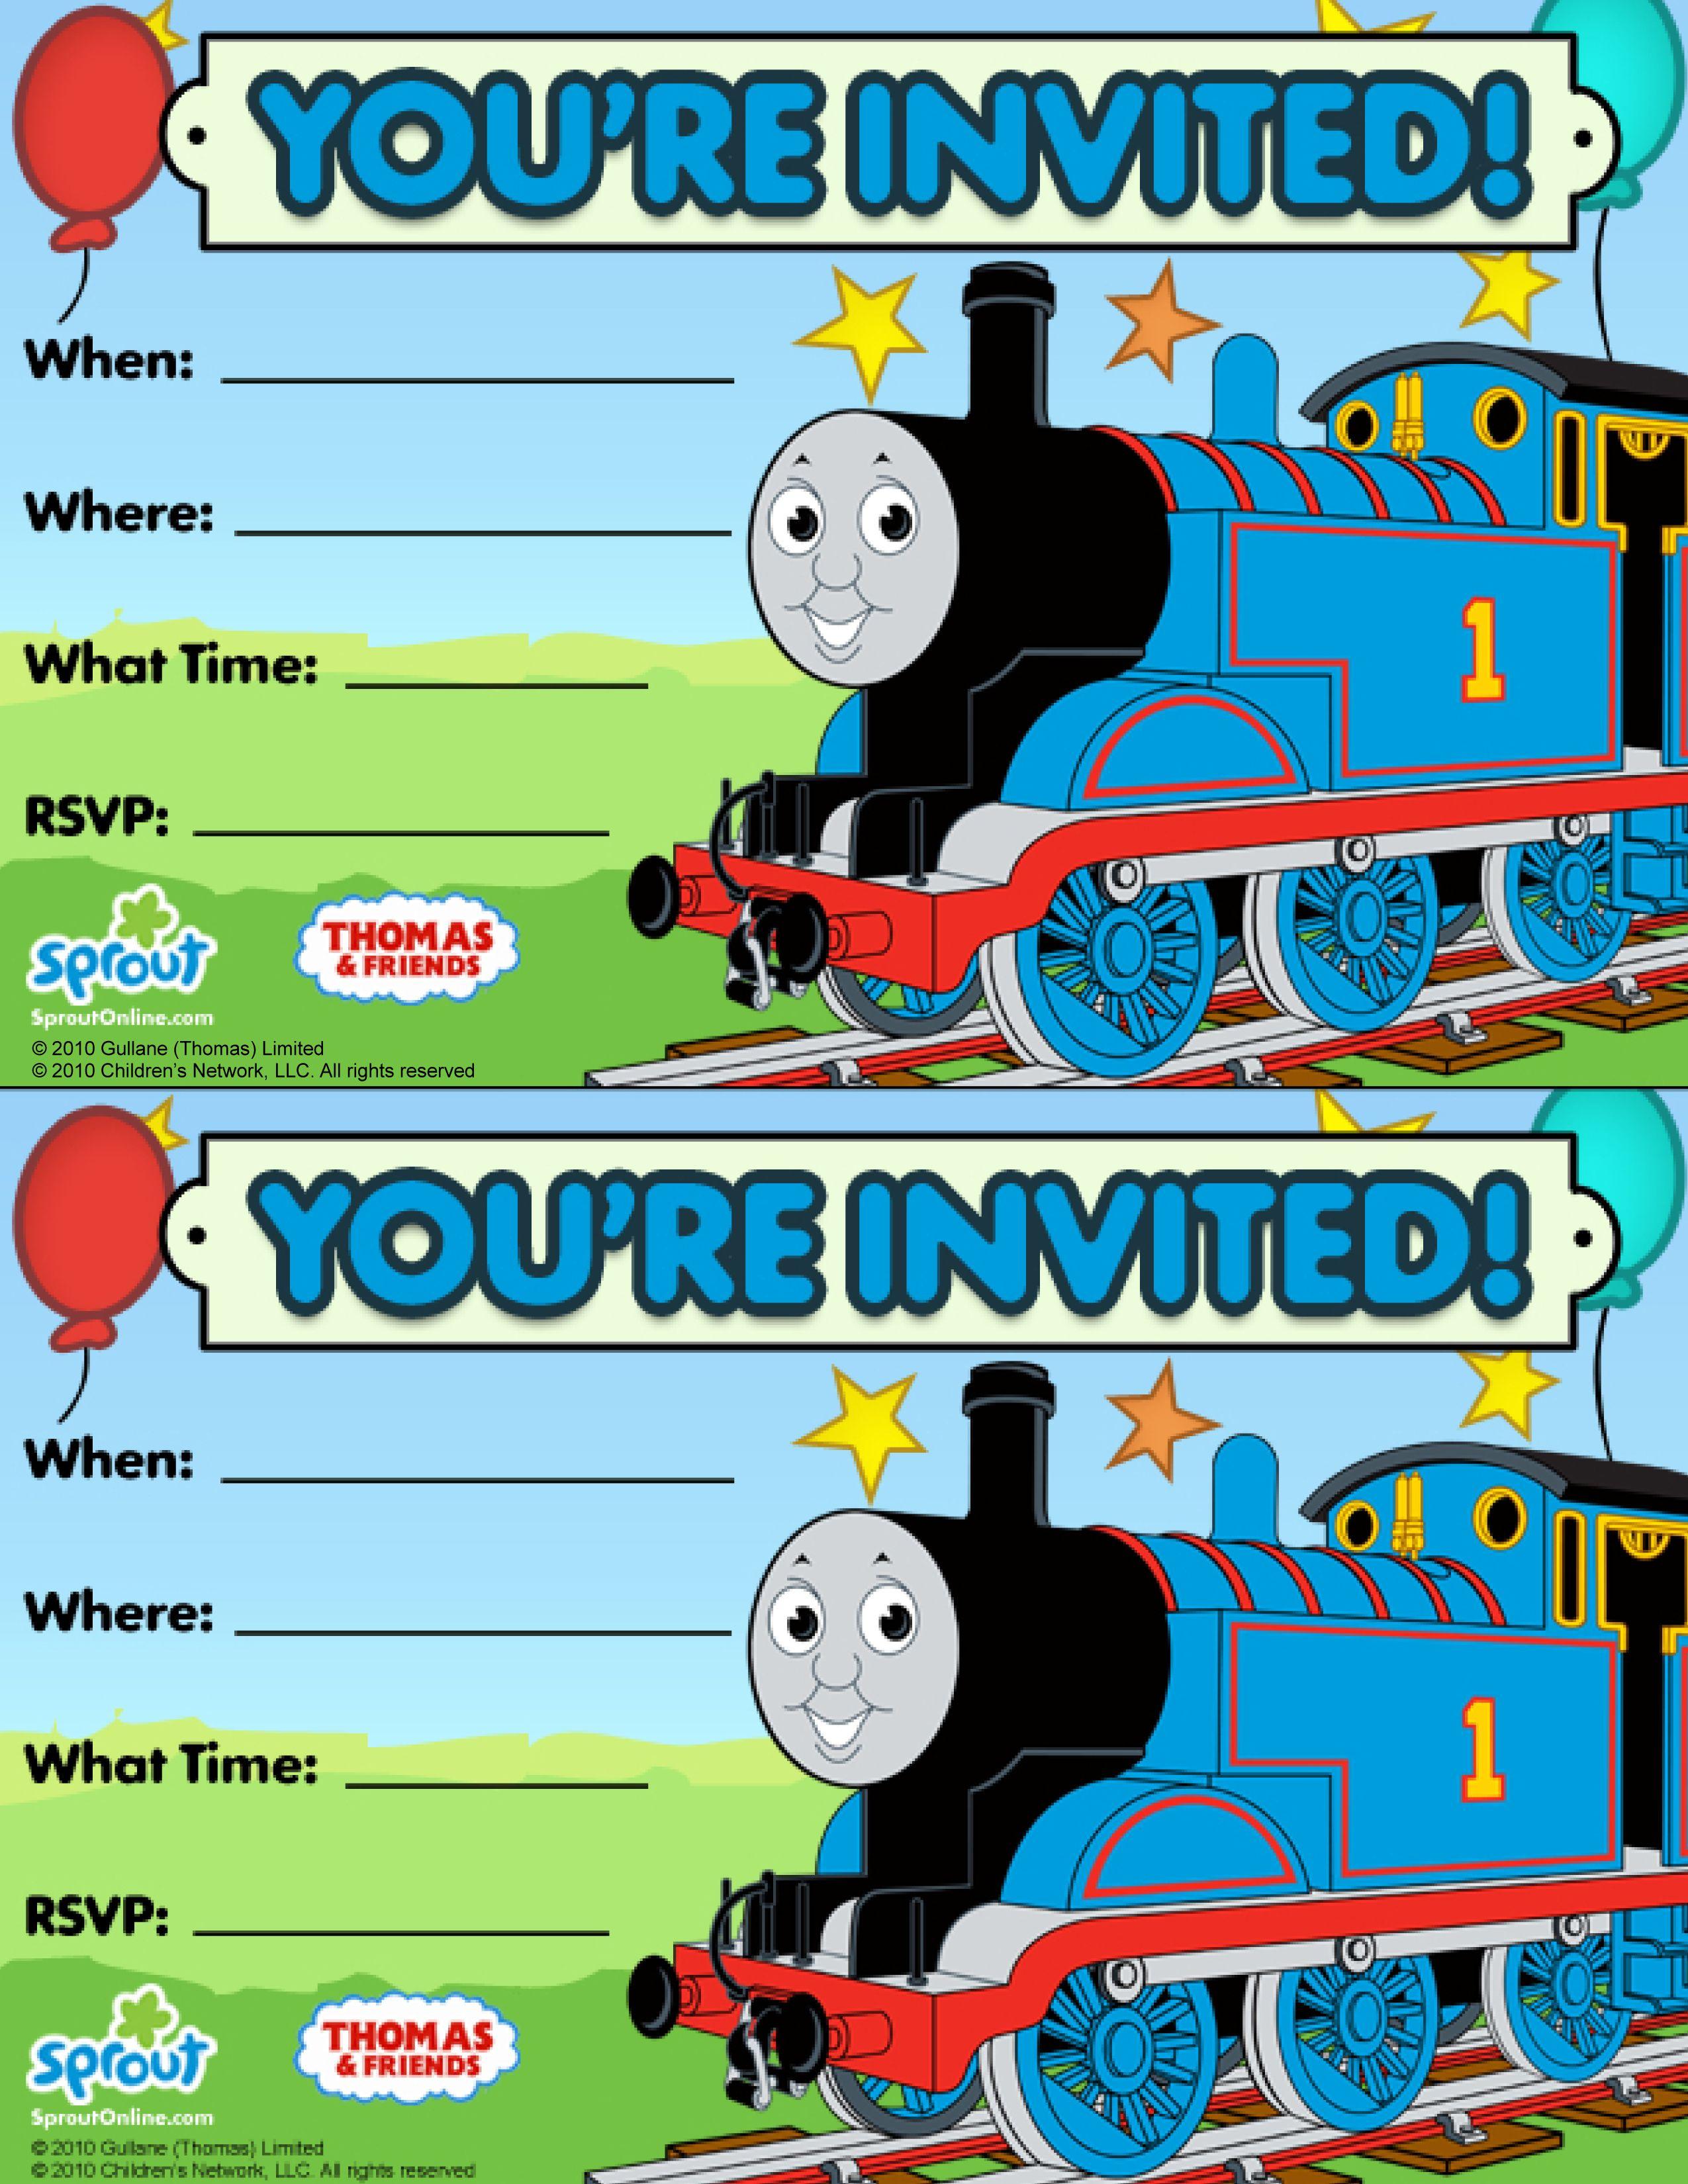 Thomas & Friends Party Invitation: Free   Birthday Party Ideas - Thomas Invitations Printable Free